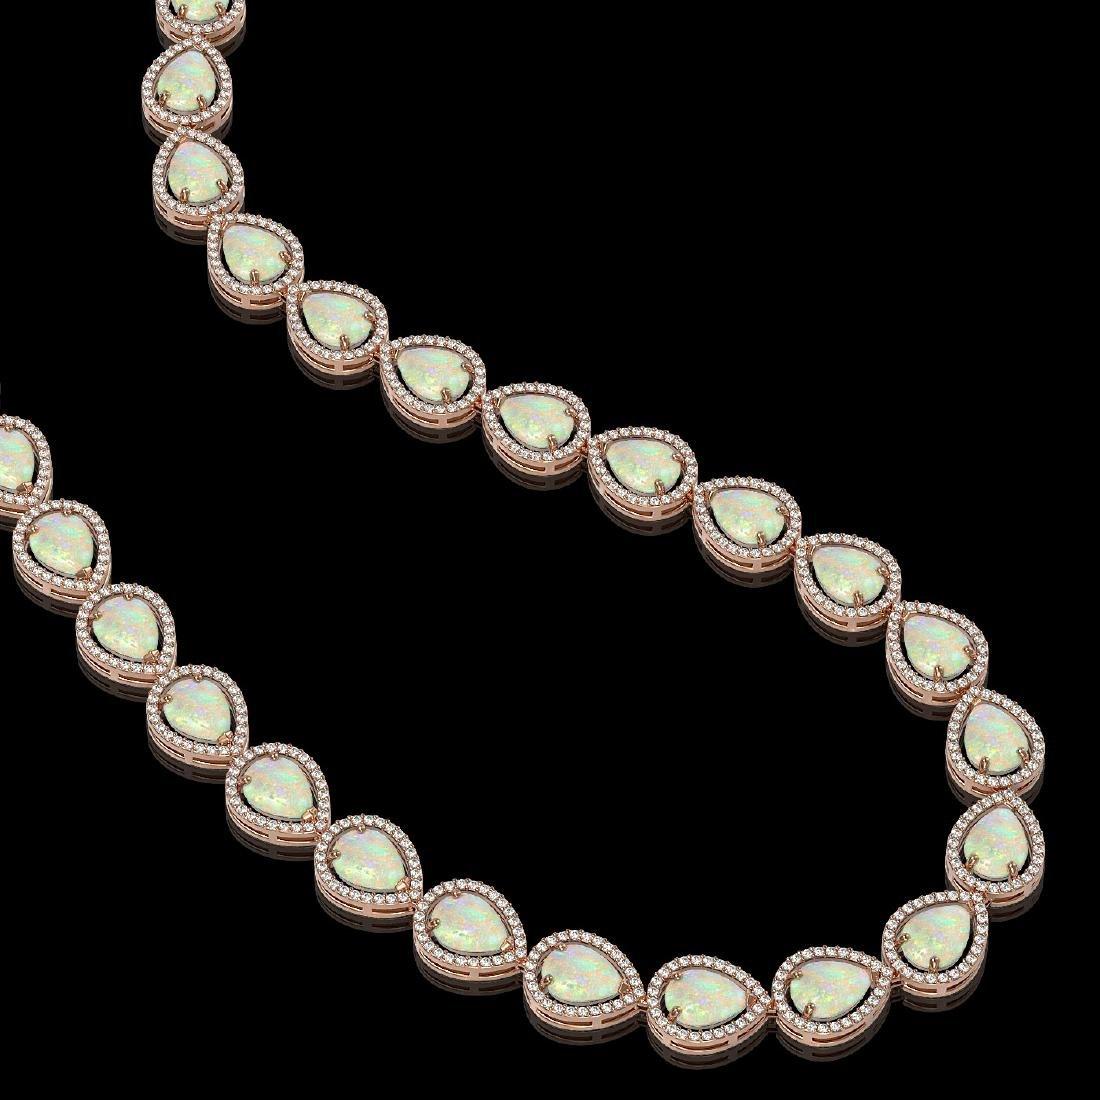 36.48 CTW Opal & Diamond Halo Necklace 10K Rose Gold - 2